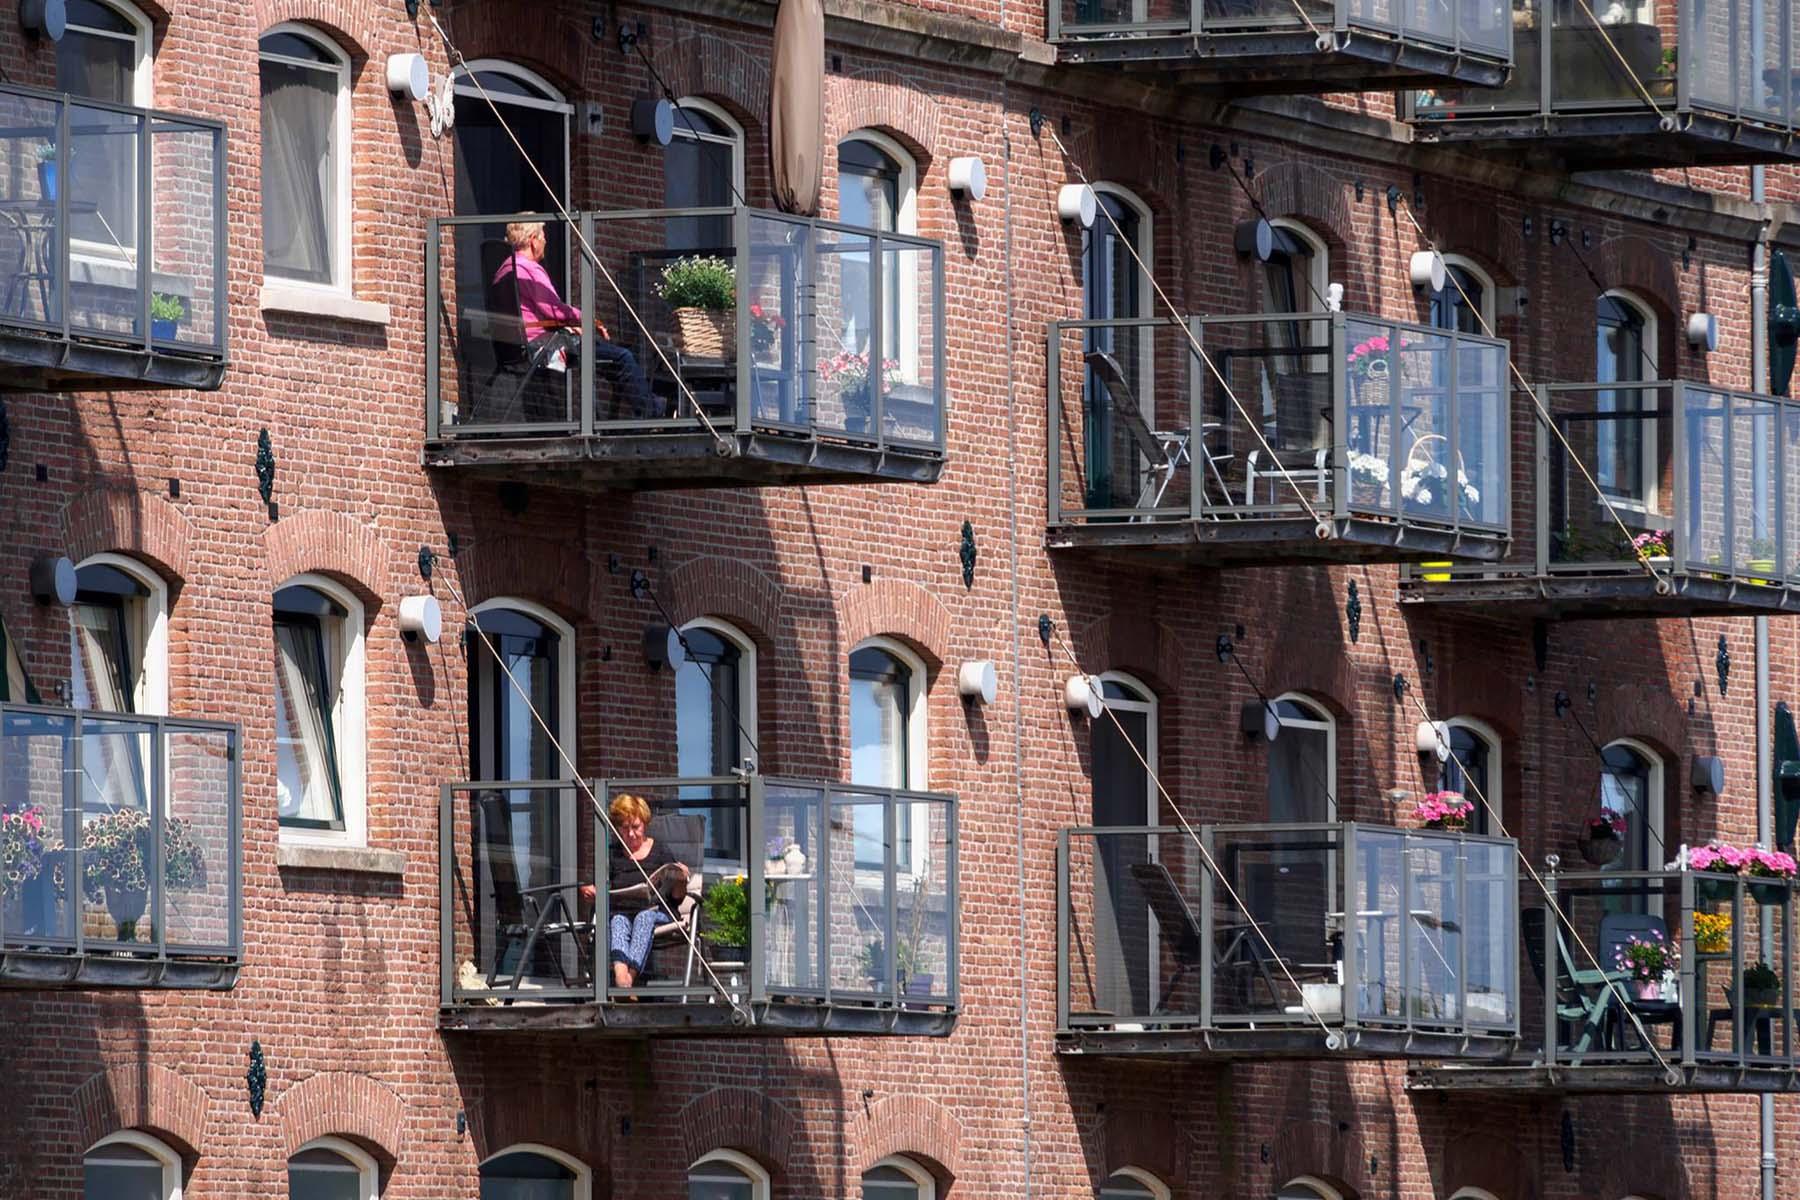 Dutch balconies